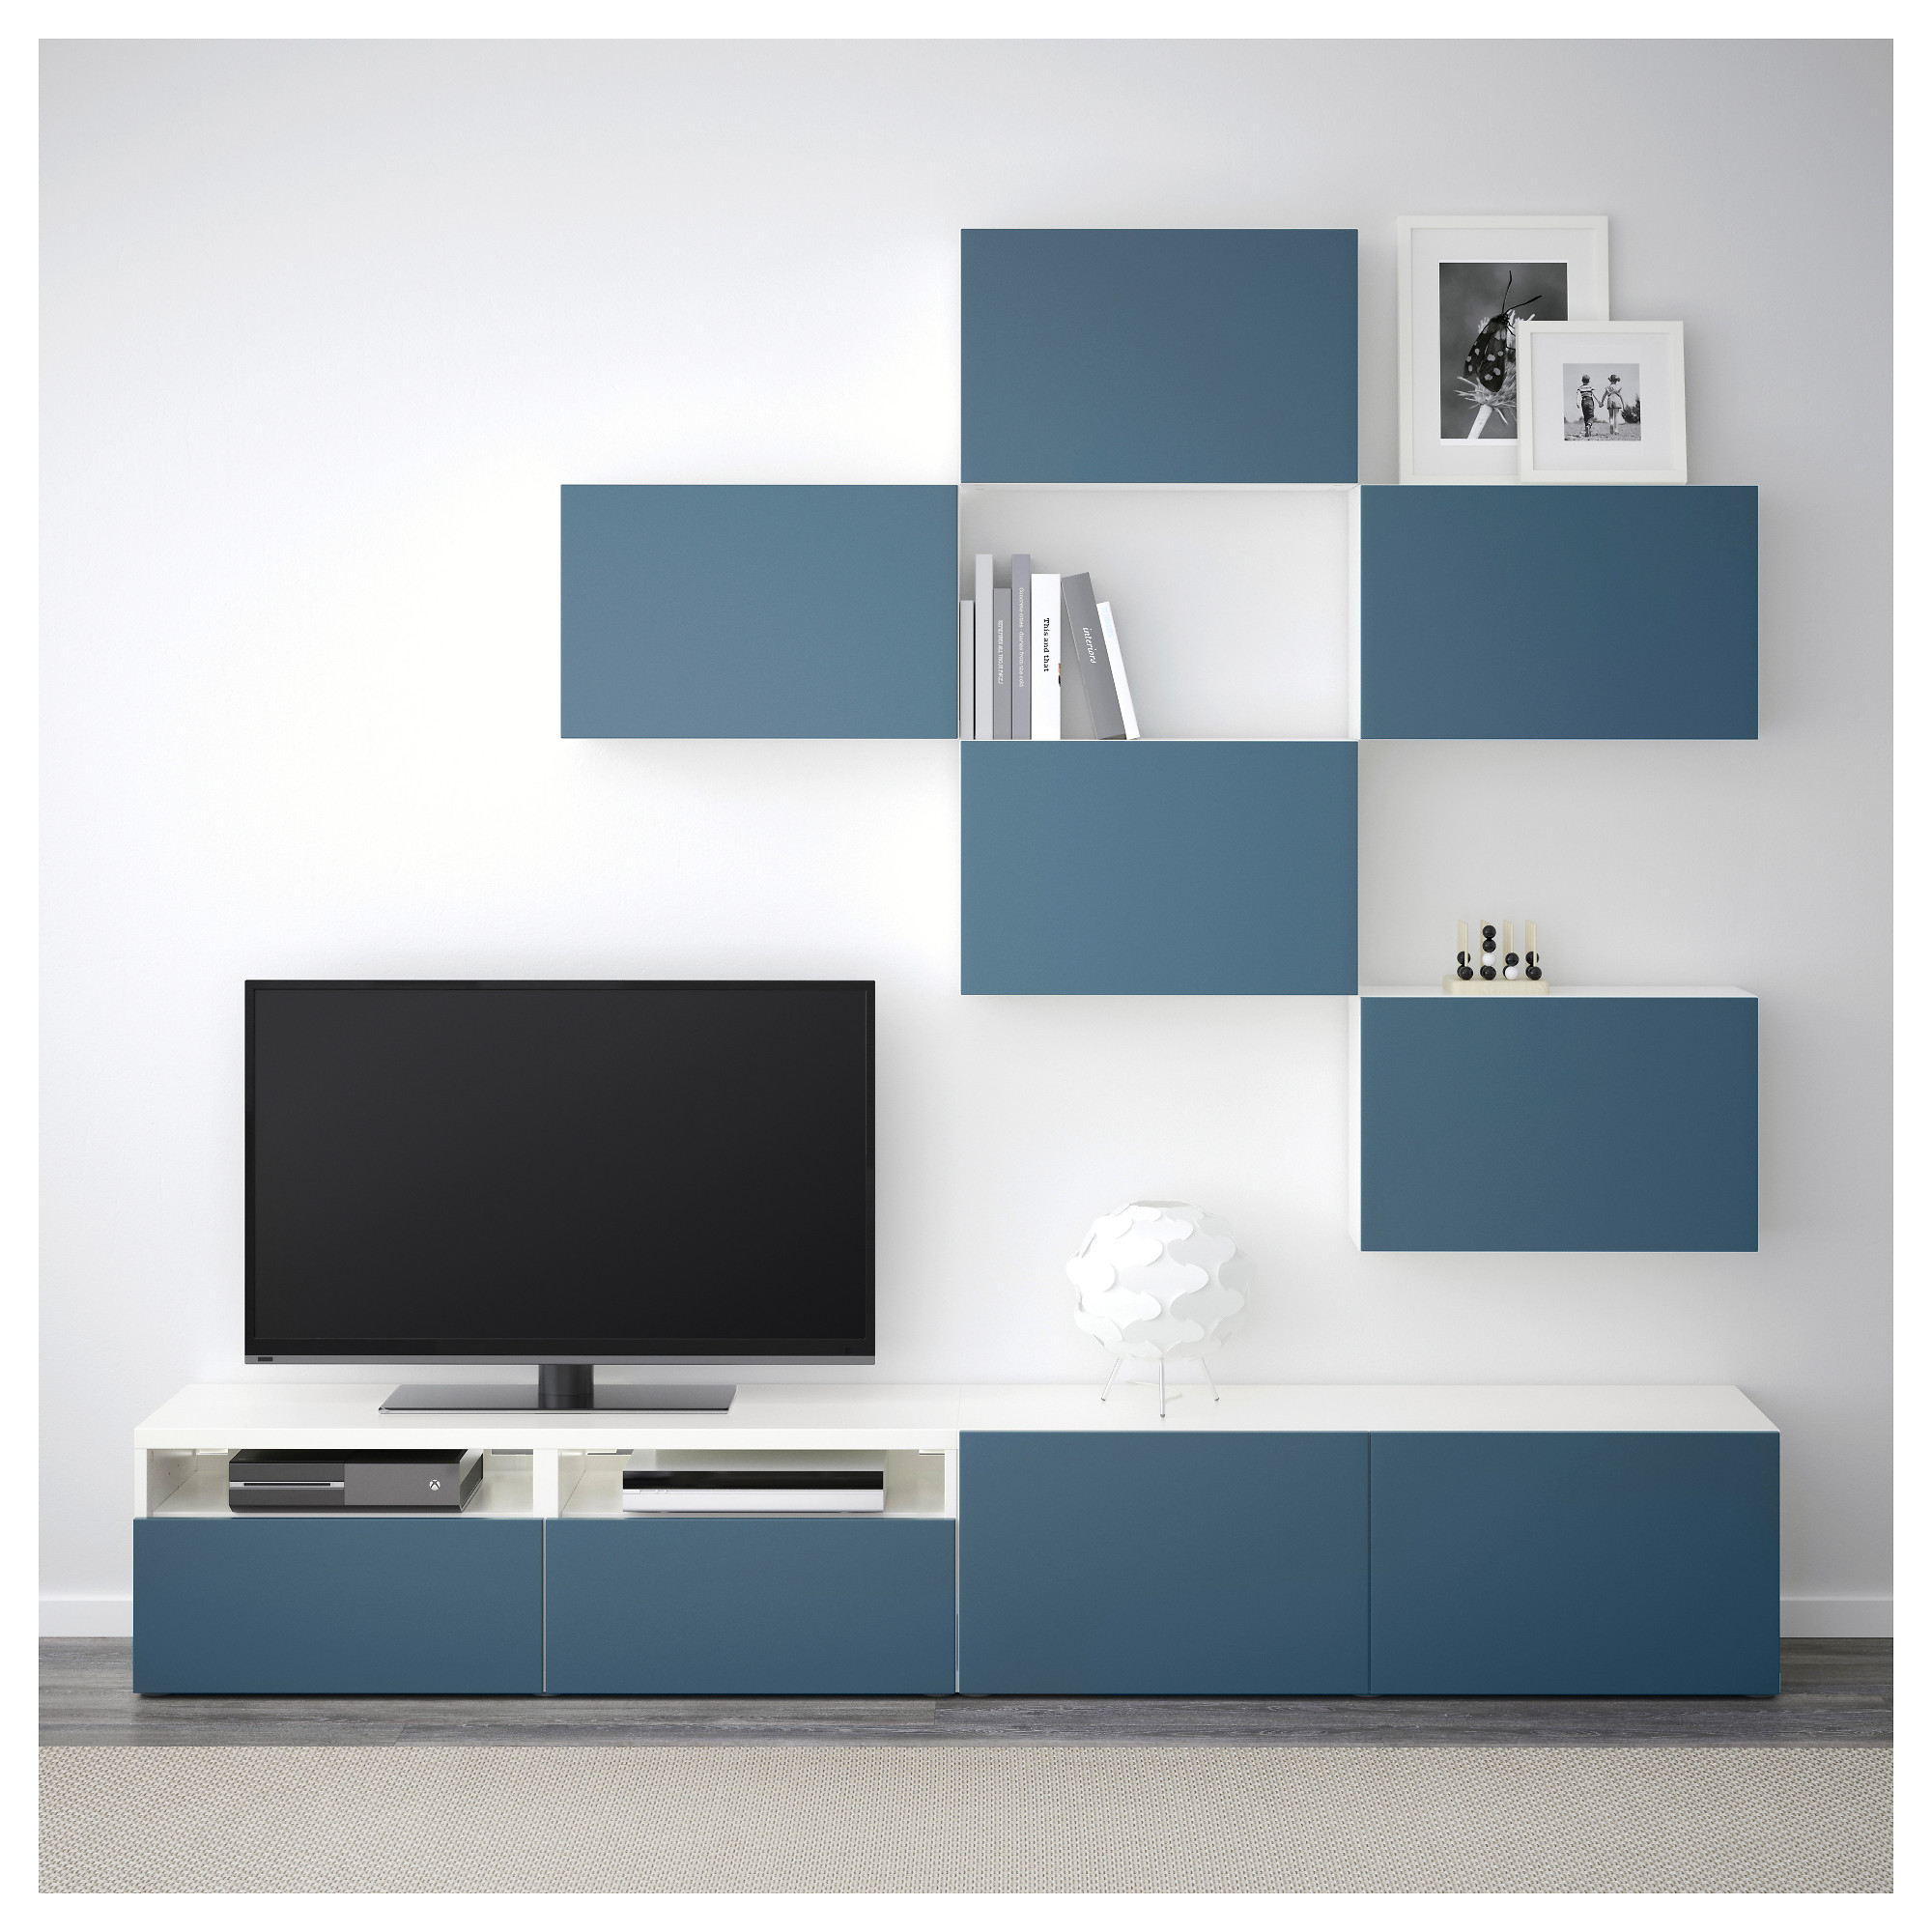 Шкаф для ТВ, комбинация БЕСТО темно-синий артикуль № 892.516.79 в наличии. Онлайн магазин ИКЕА Беларусь. Недорогая доставка и установка.